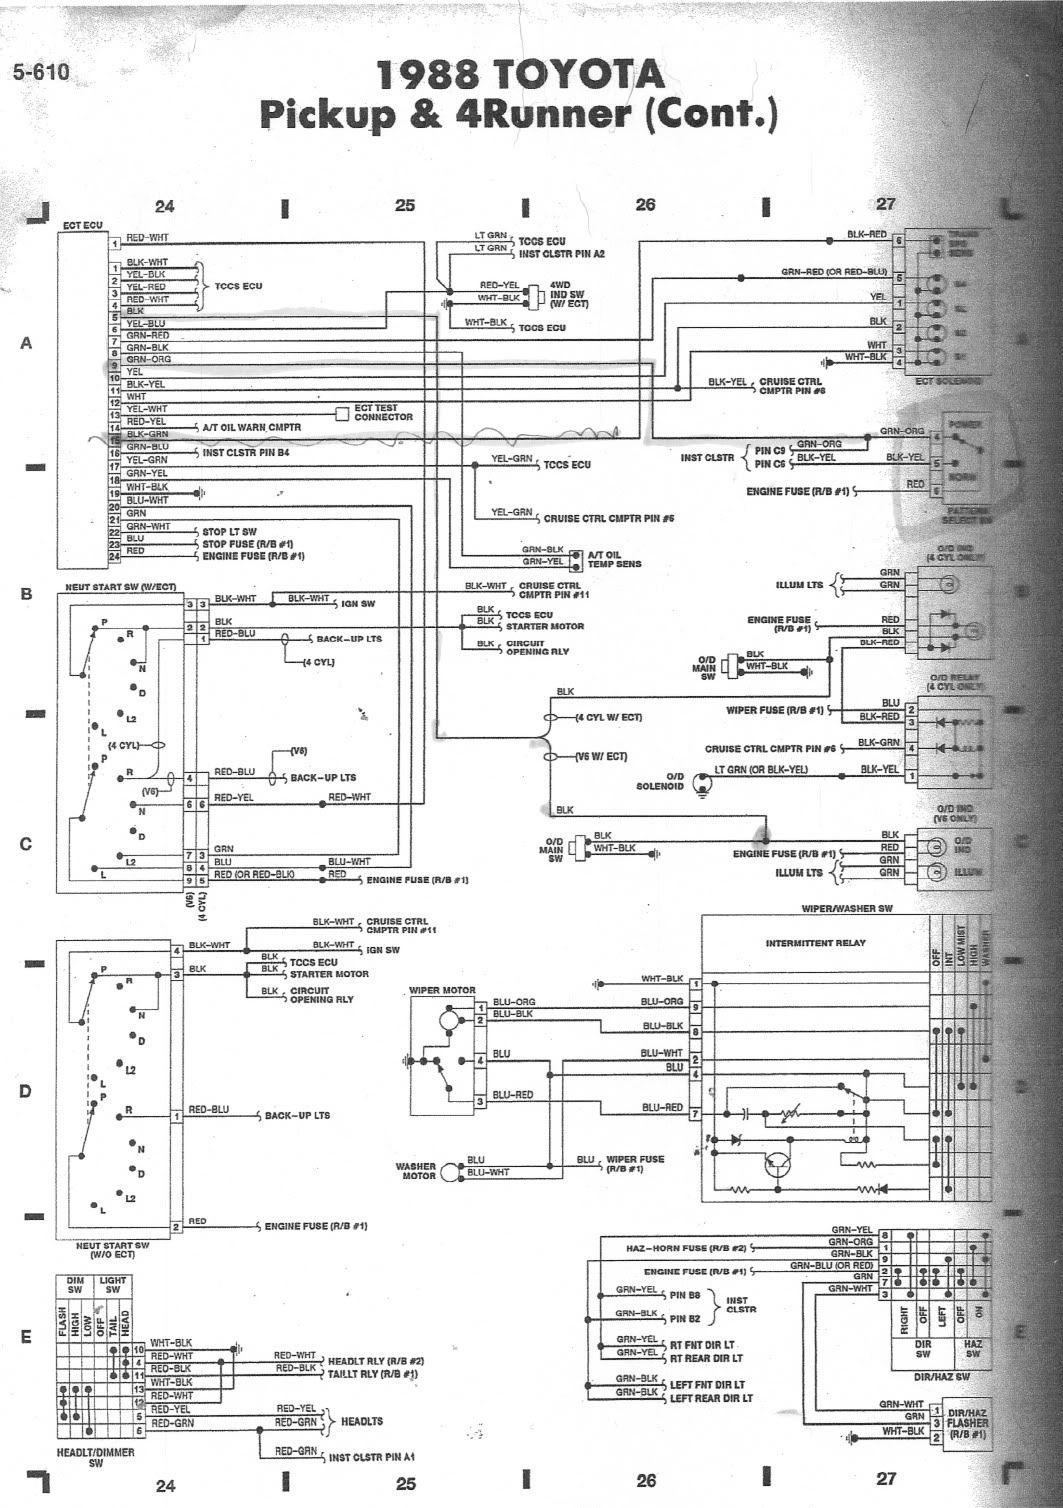 HF_9003] 3Vze Wiring Harness Diagram Free DiagramYnthe Sapre Vesi Para Numap Mohammedshrine Librar Wiring 101